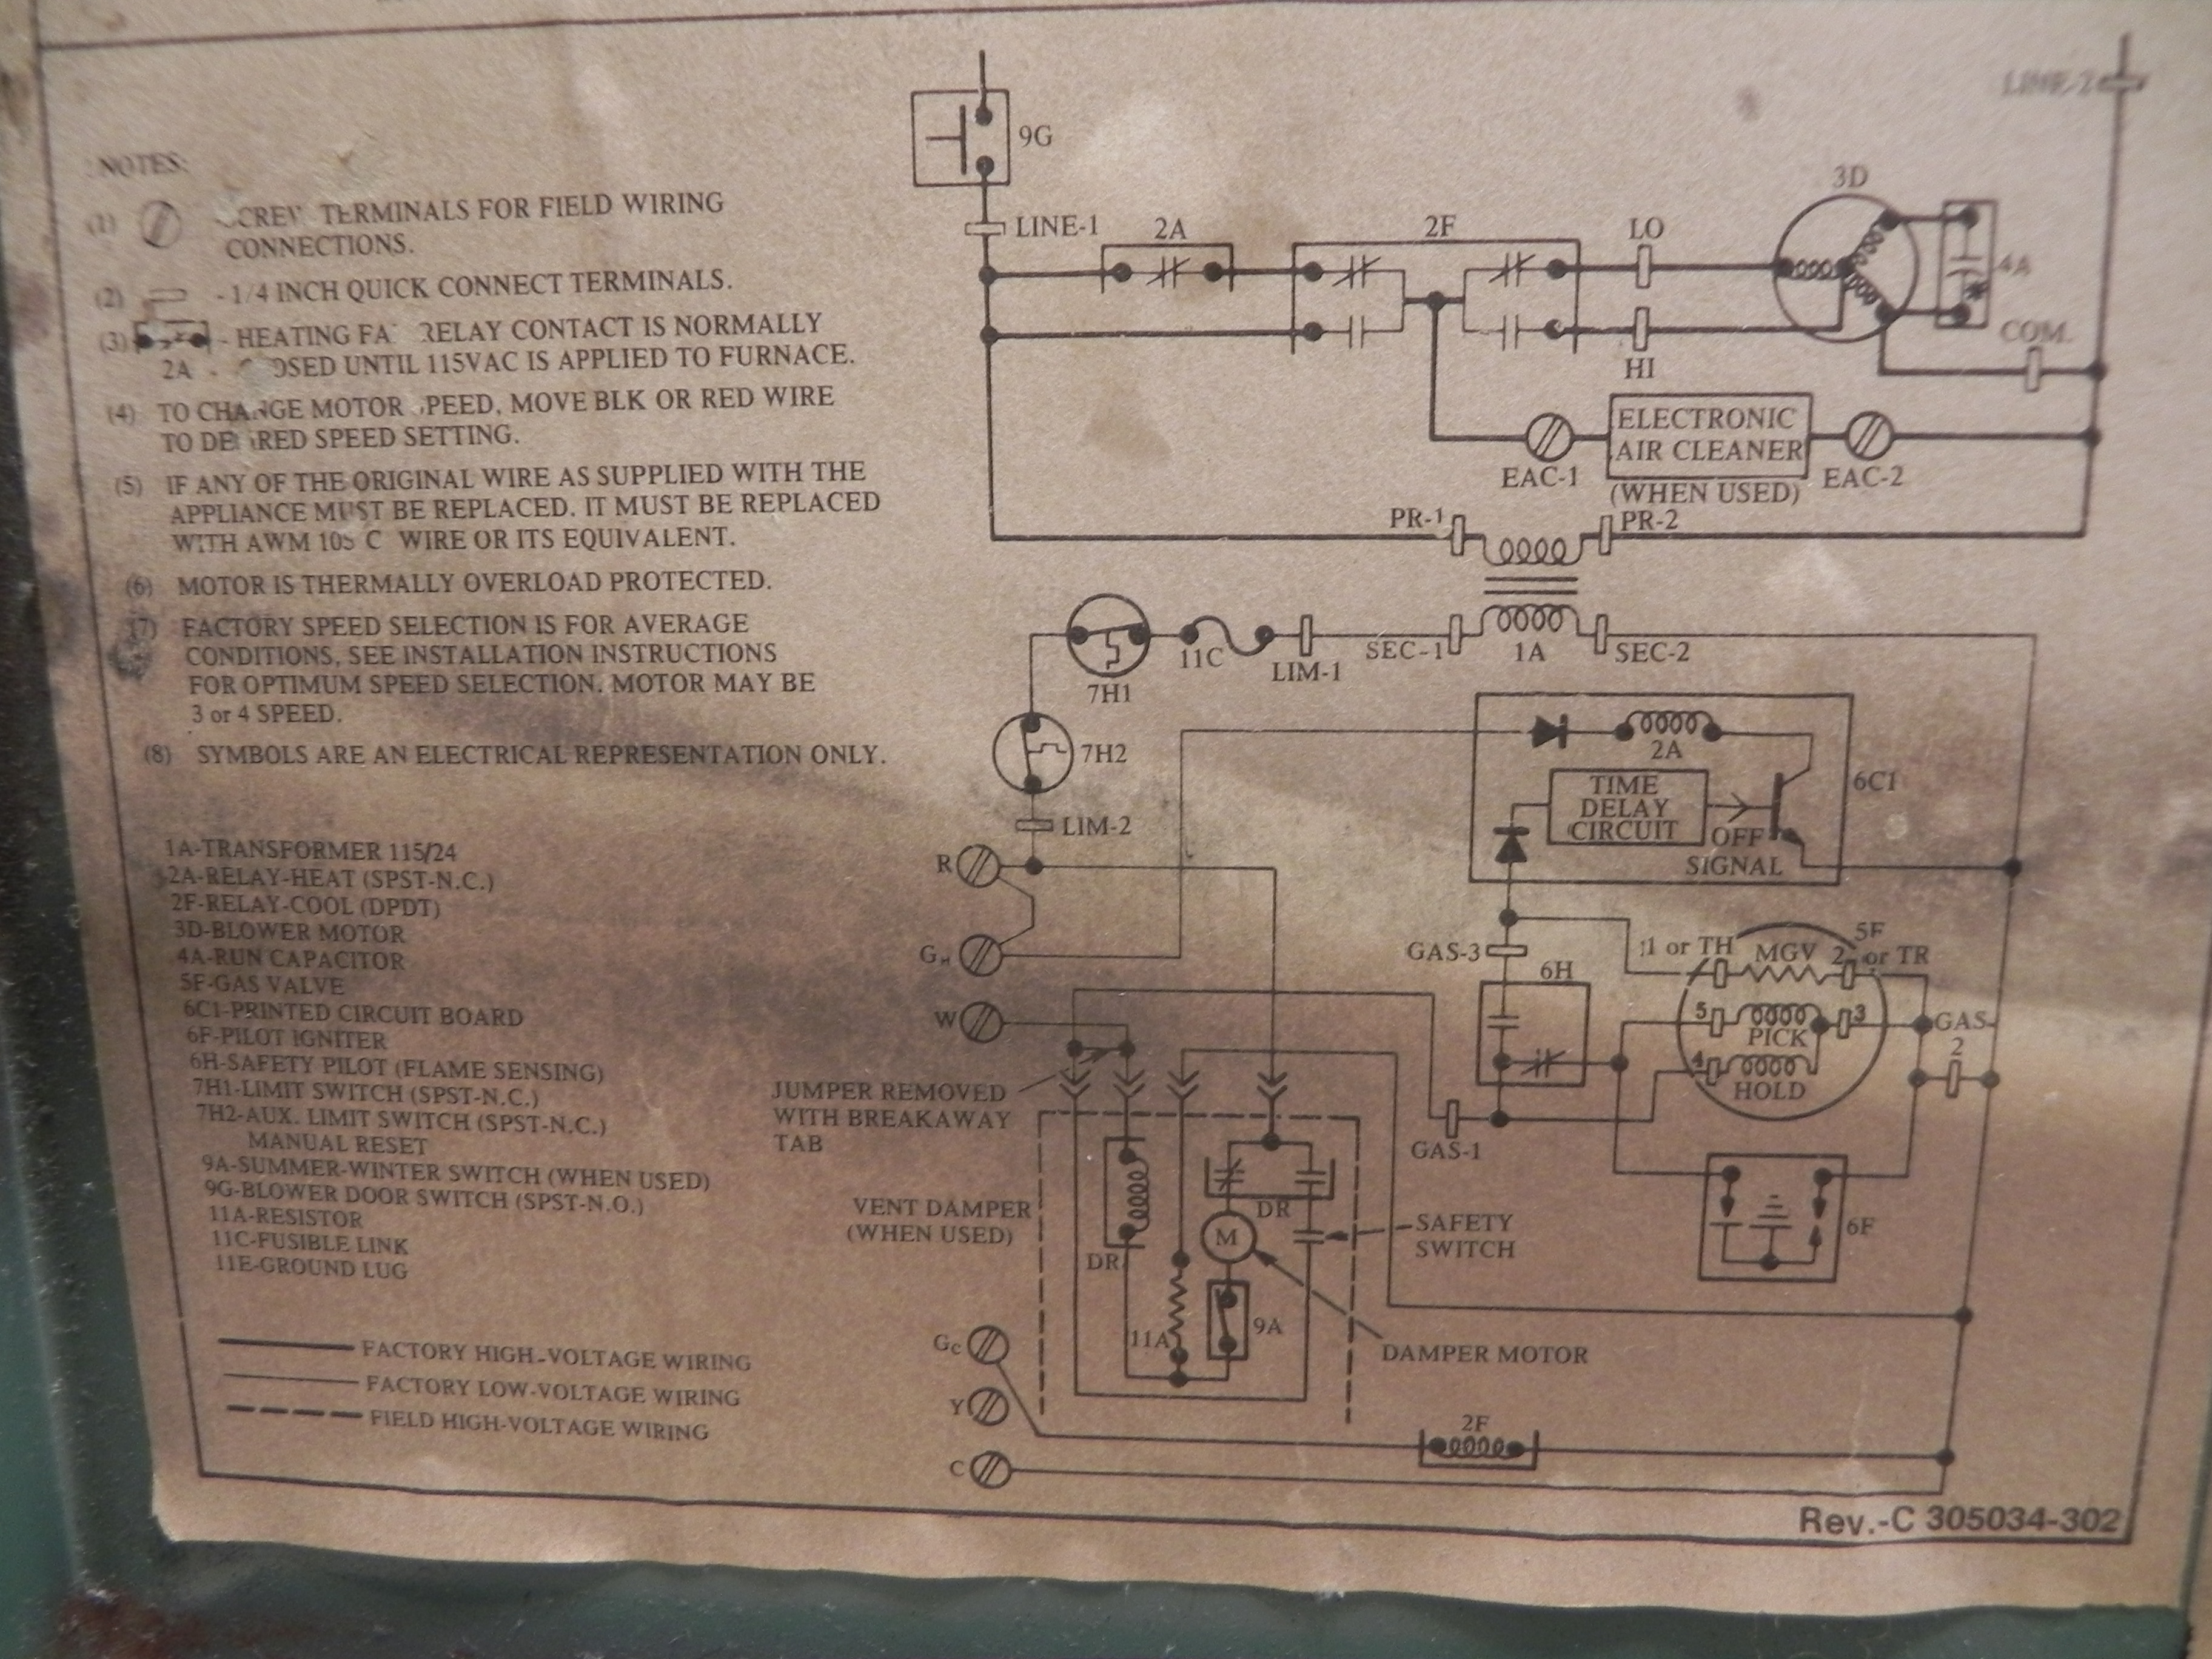 Mercedes Benz Wiring Diagram Http Wwwjustanswercom Mercedes 2j0n9